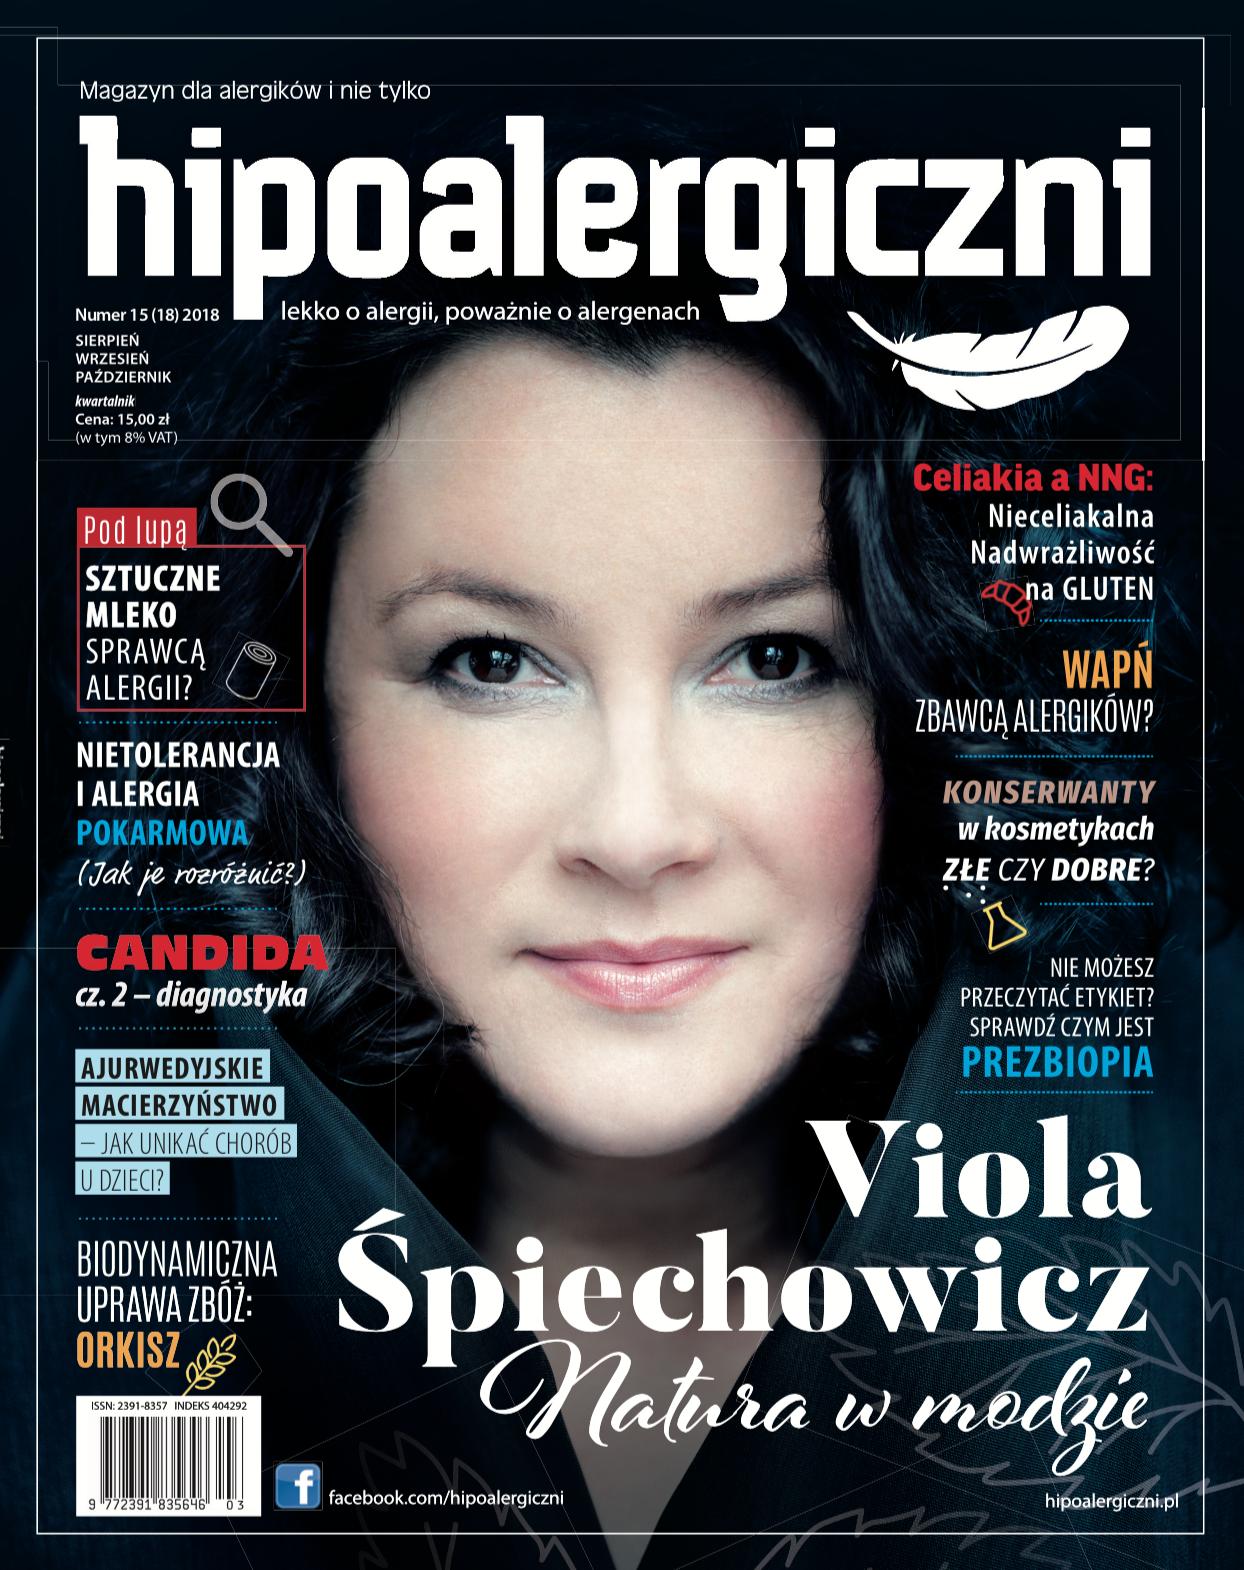 Magazyn Hipoalergiczni_2018_08_Viola